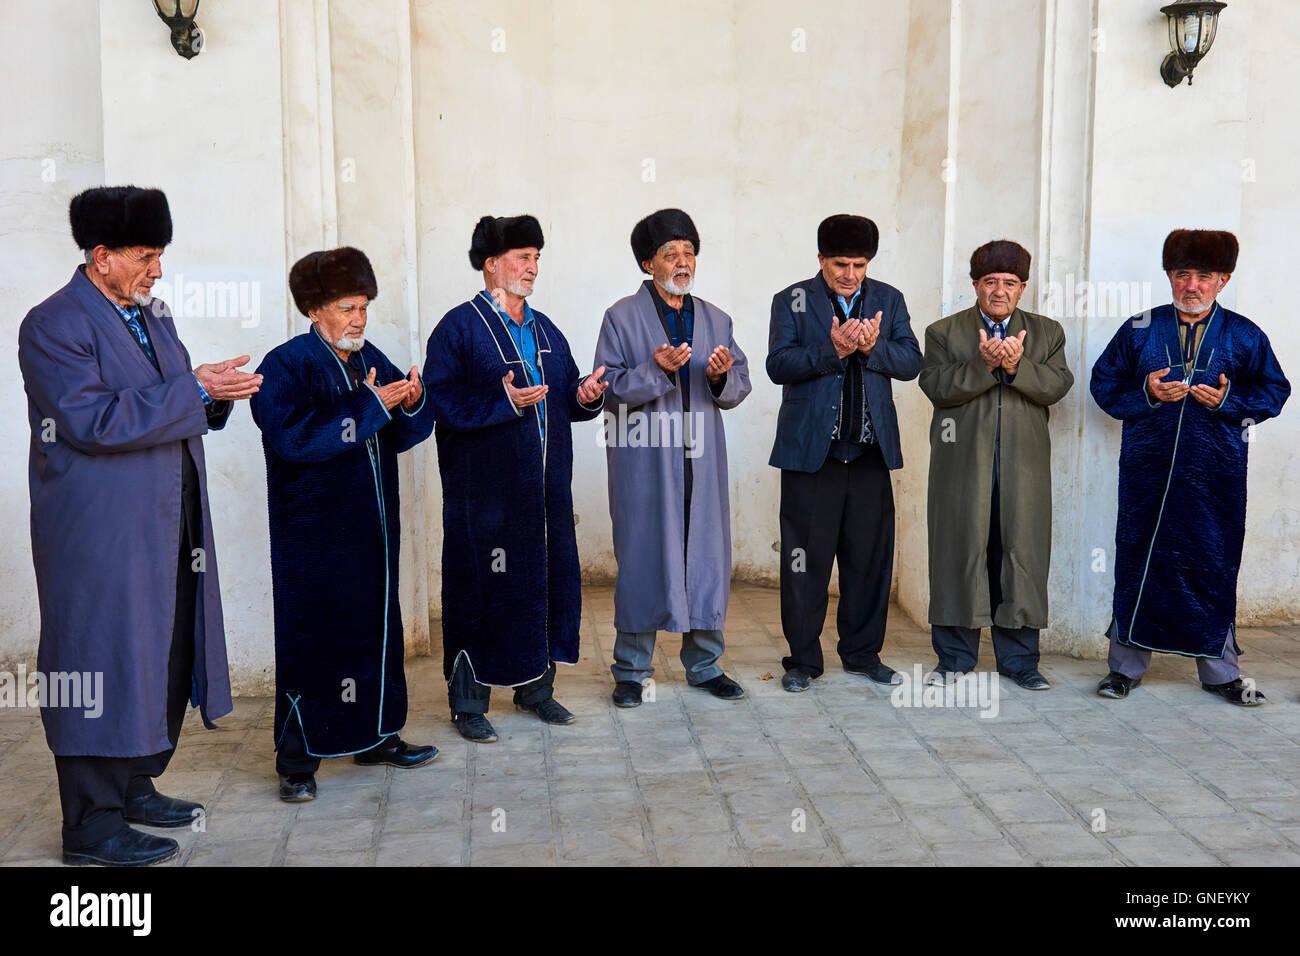 Uzbekistan, Bukhara, Unesco world heritage, prayer in the mosque - Stock Image